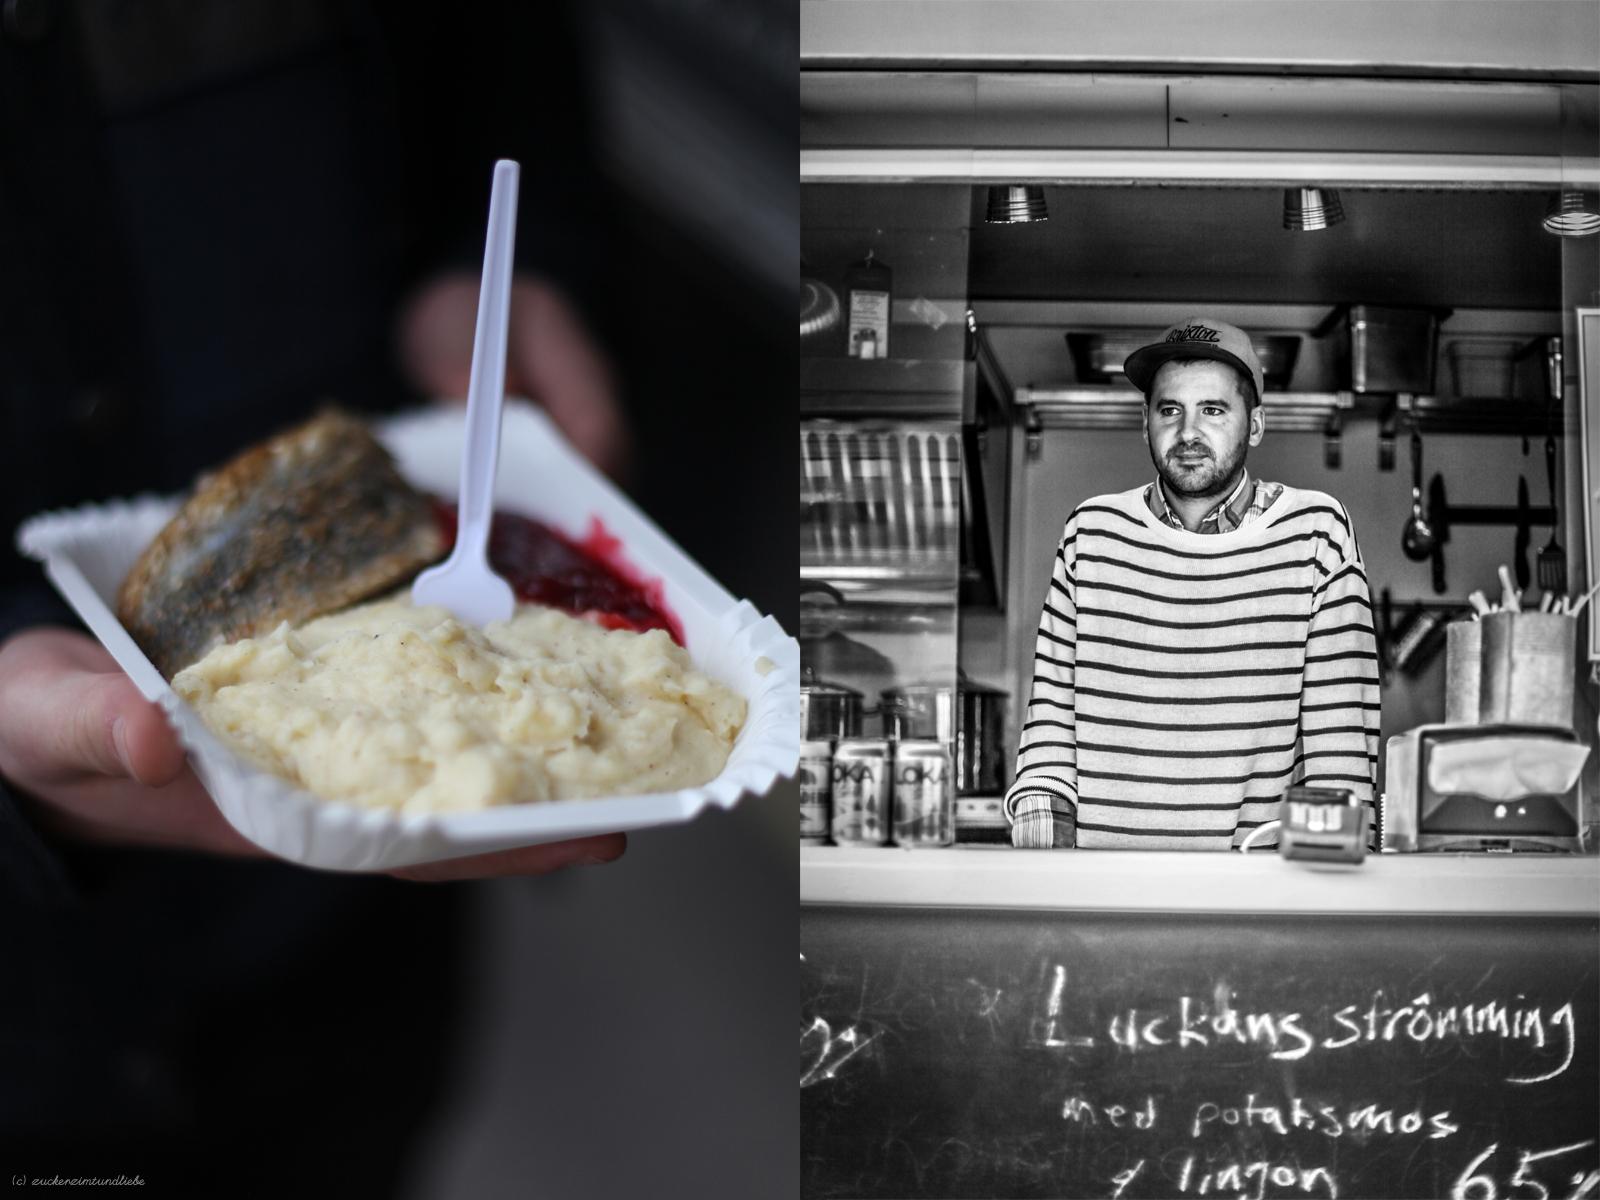 Zuckerzimtundliebe Göteborg Cafes3 Streetfood Foodtruck